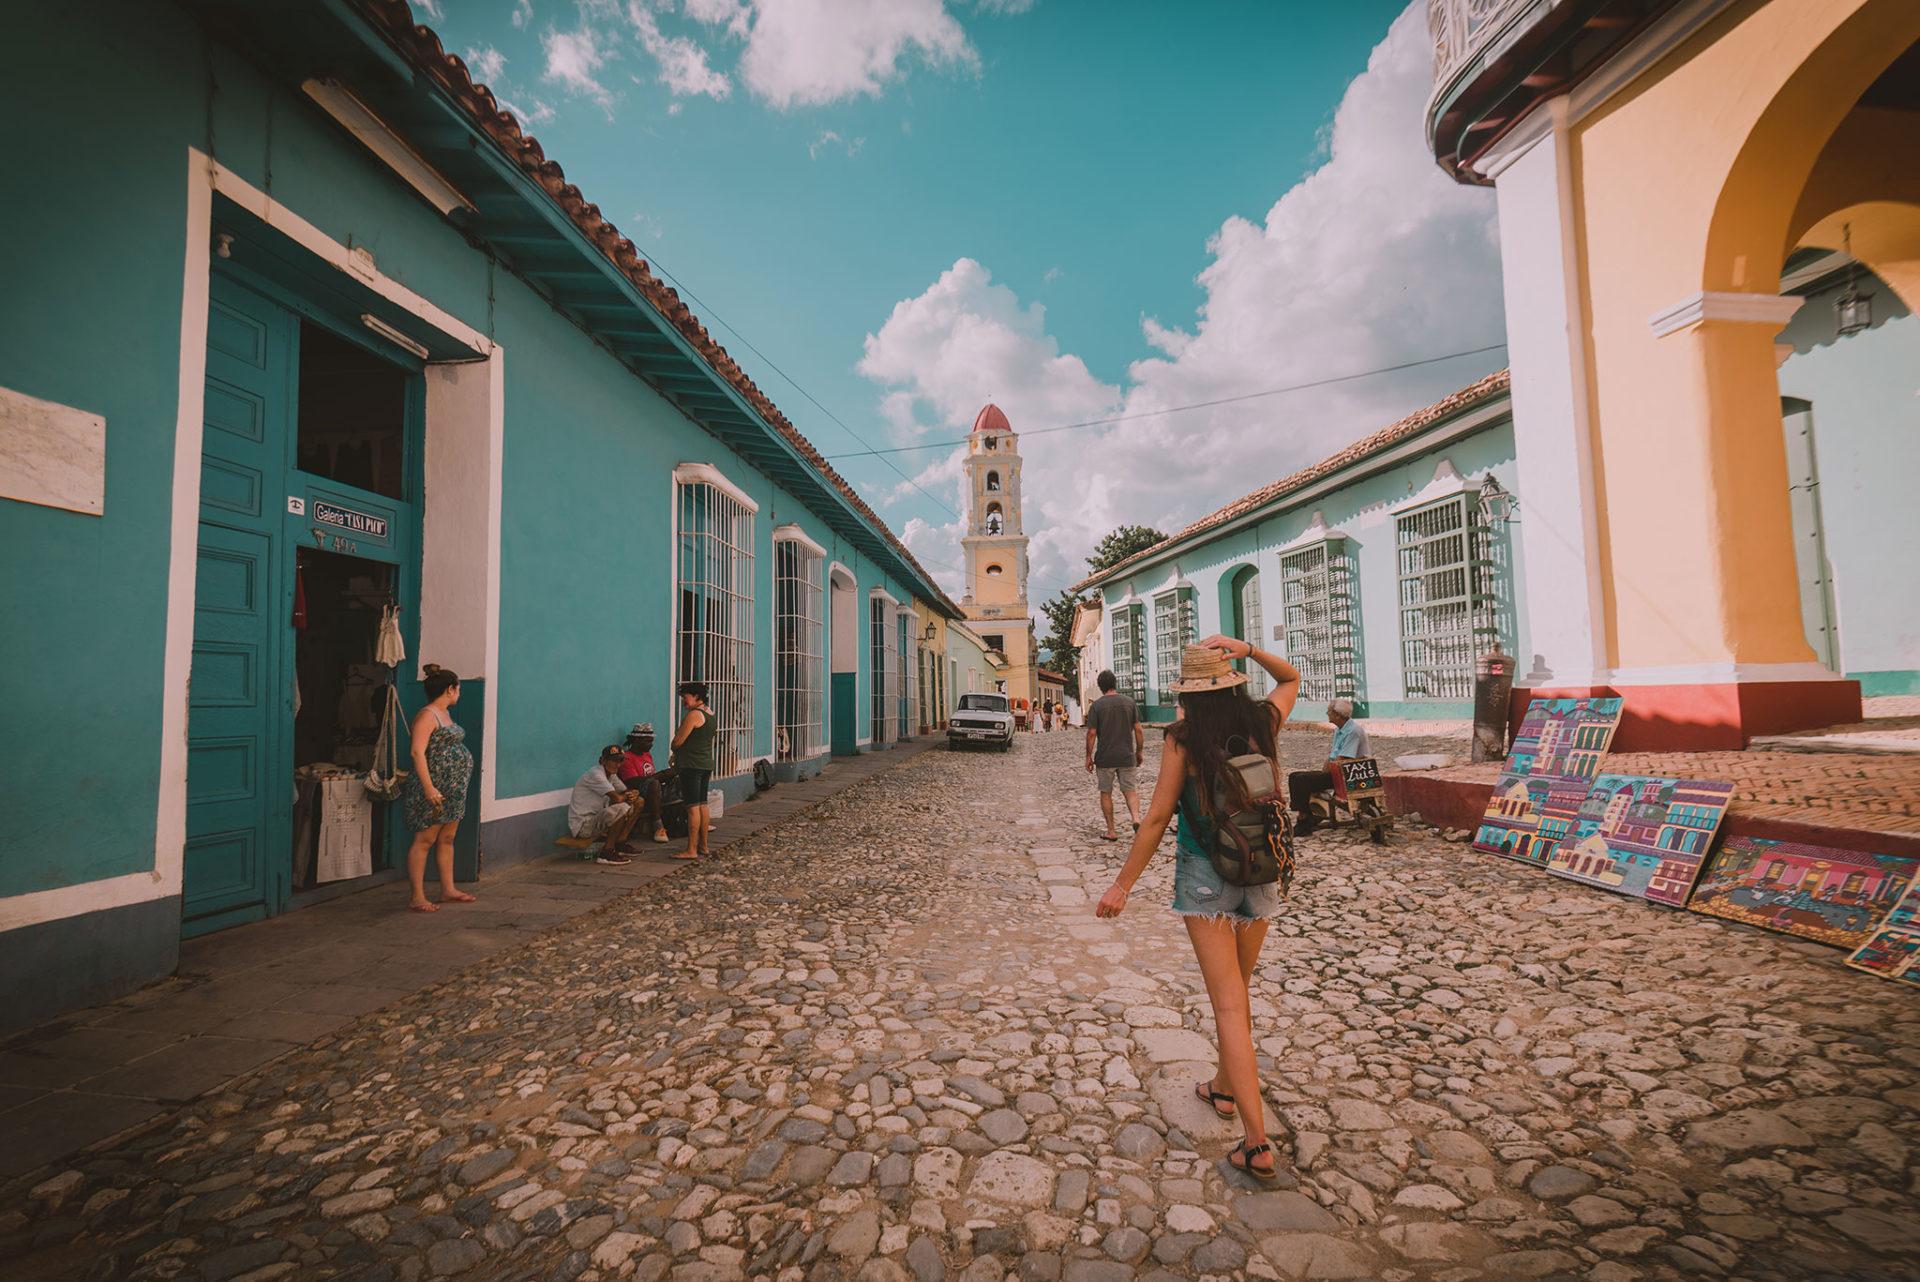 Photo de l'ambiance de Trinidad, à Cuba